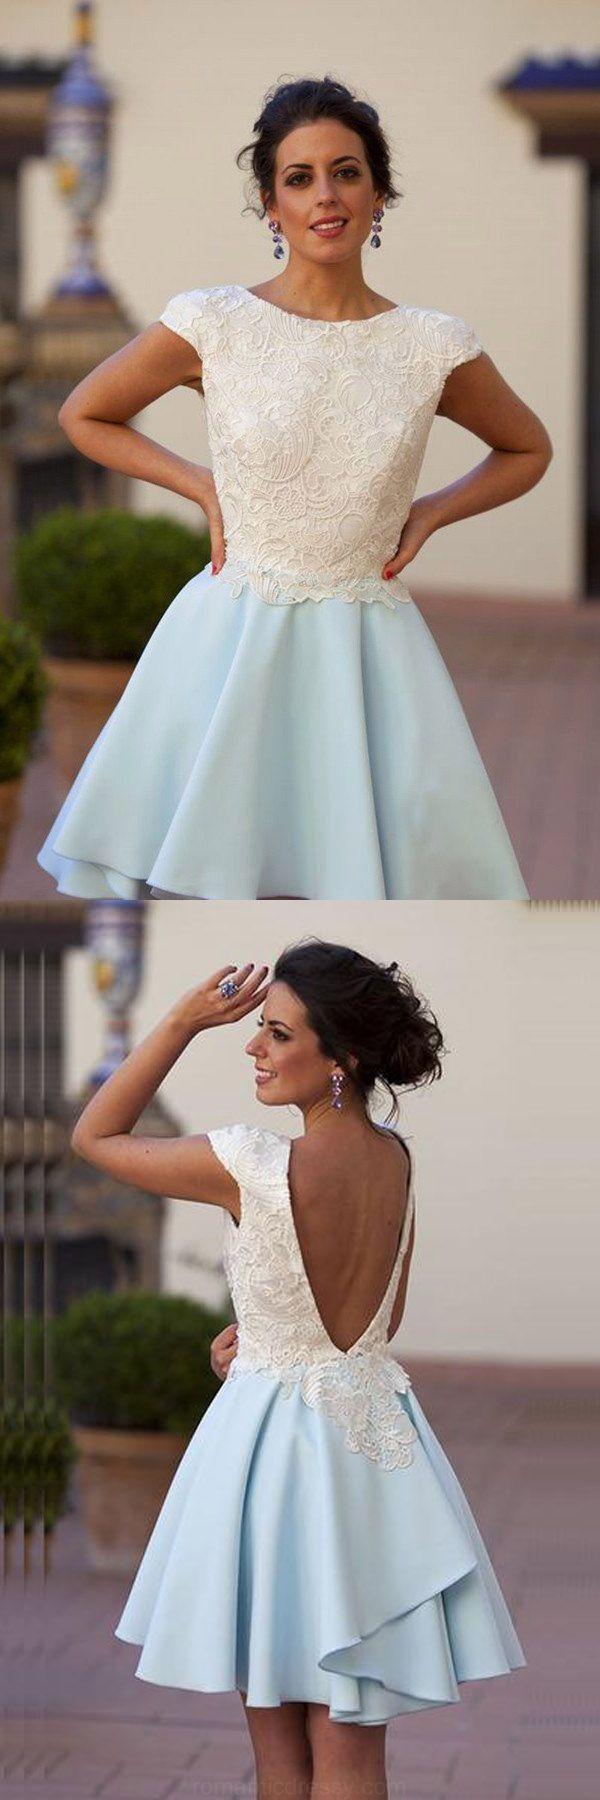 1294 best Beautiful Dress images on Pinterest | Wedding frocks ...